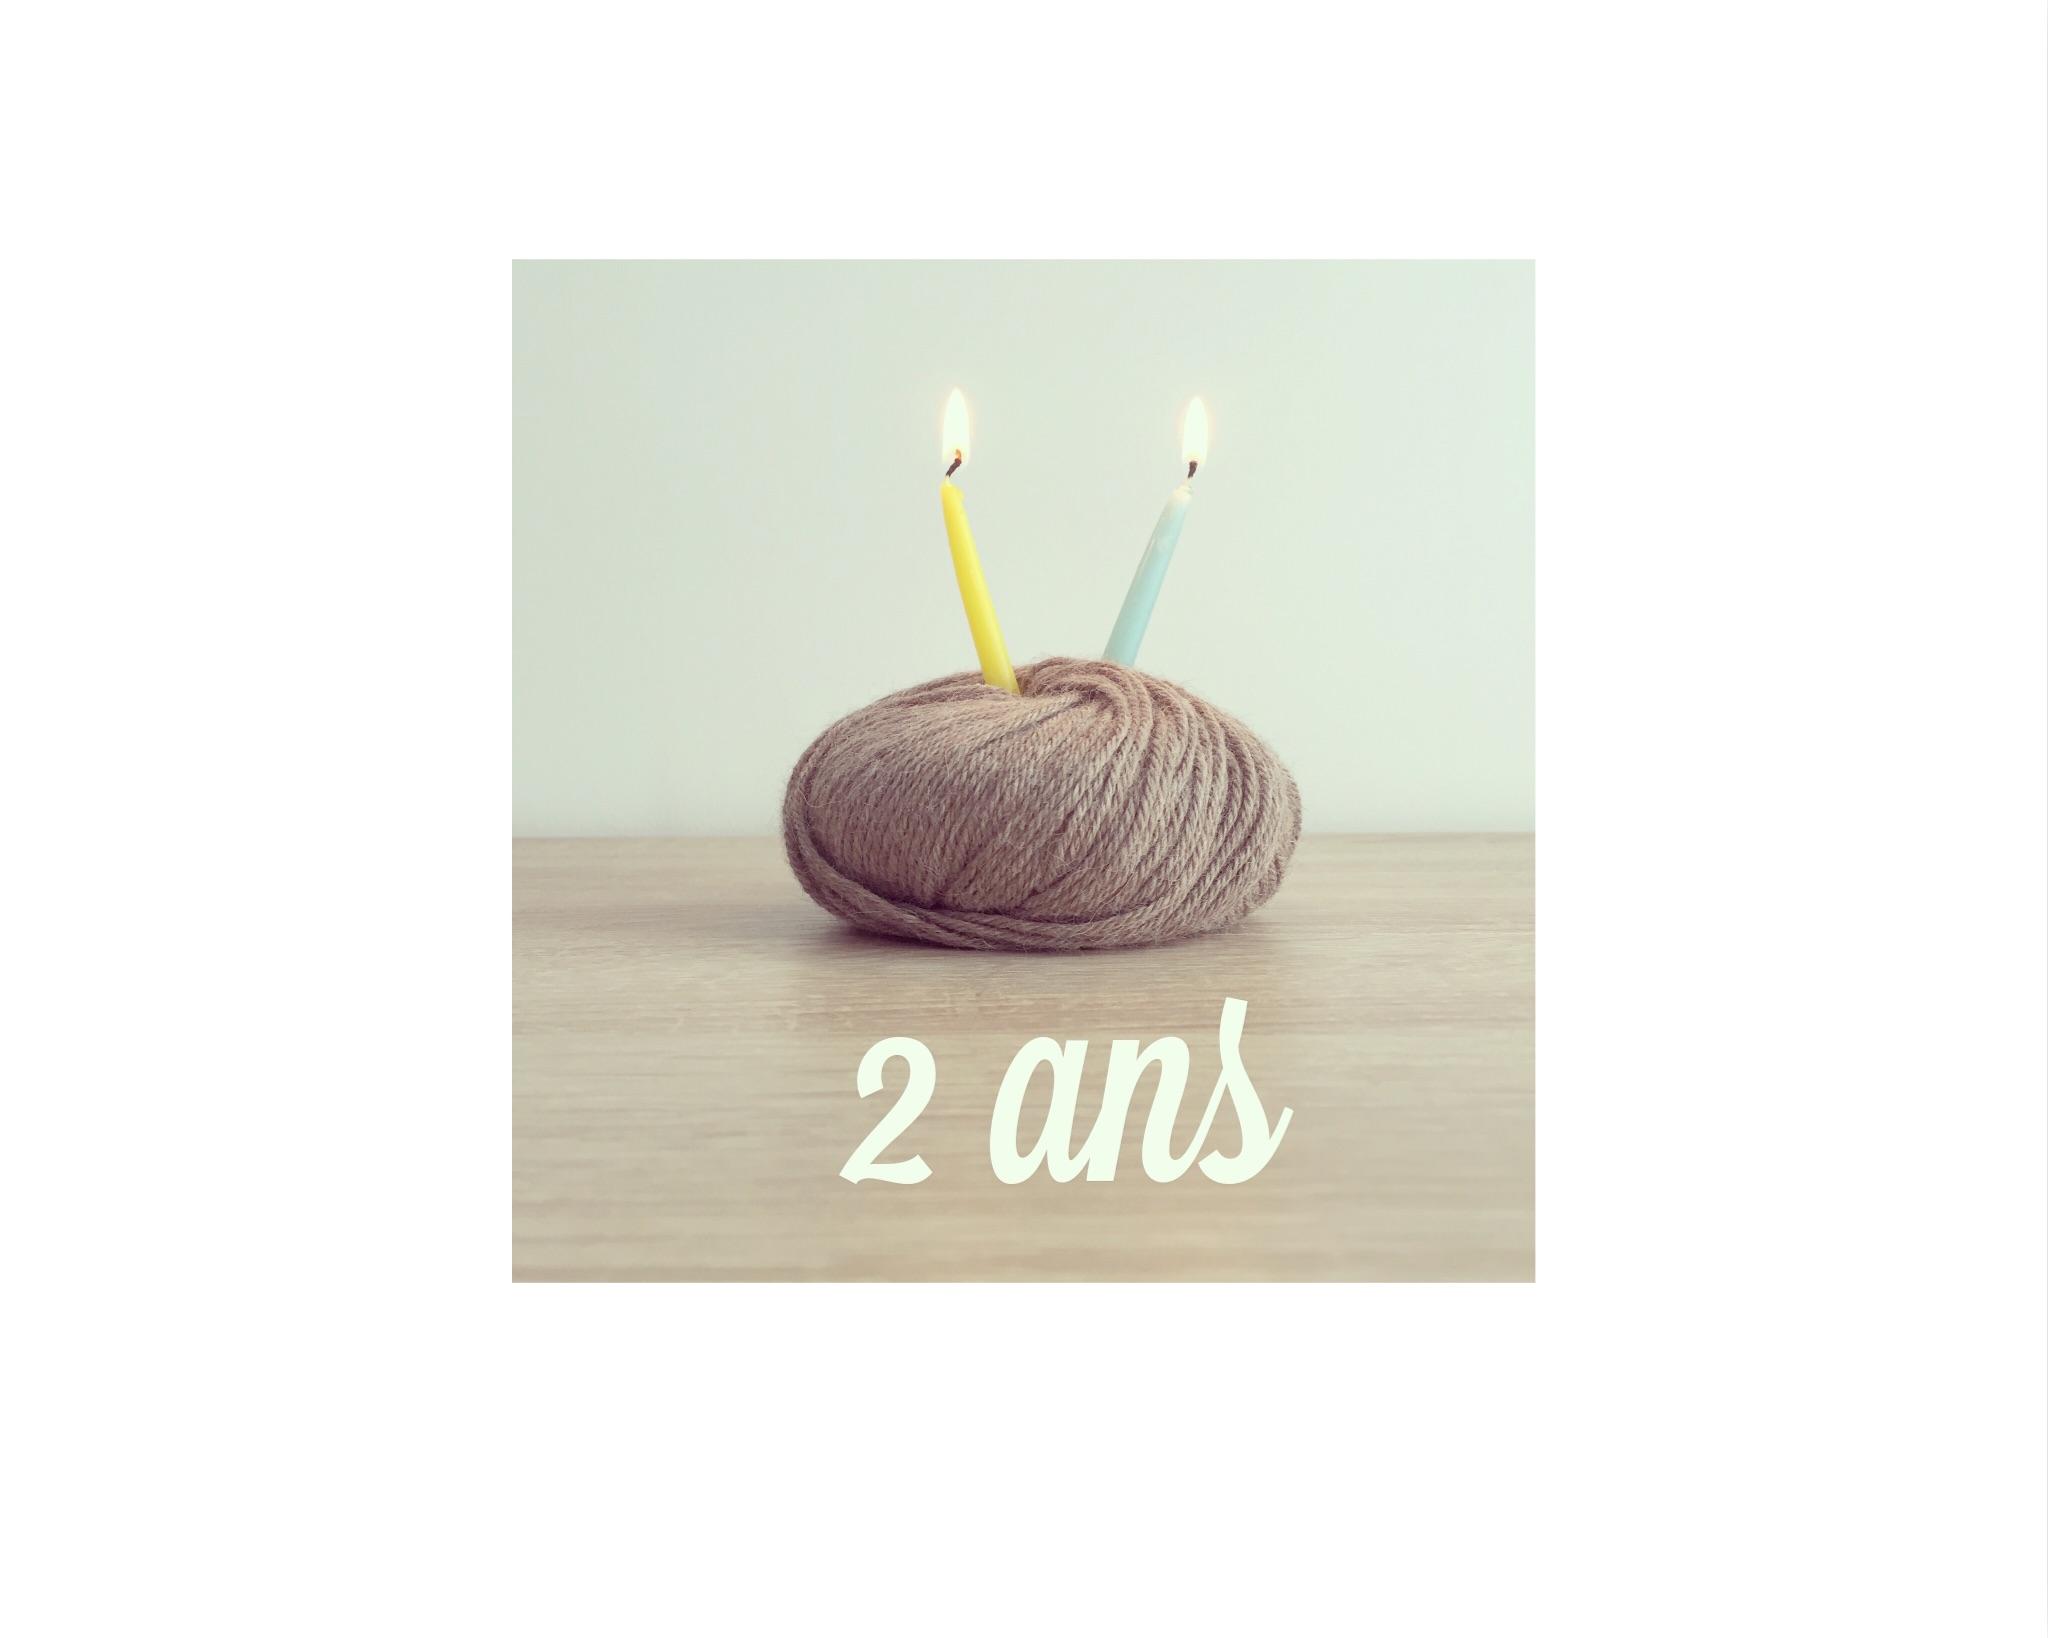 2 ans!